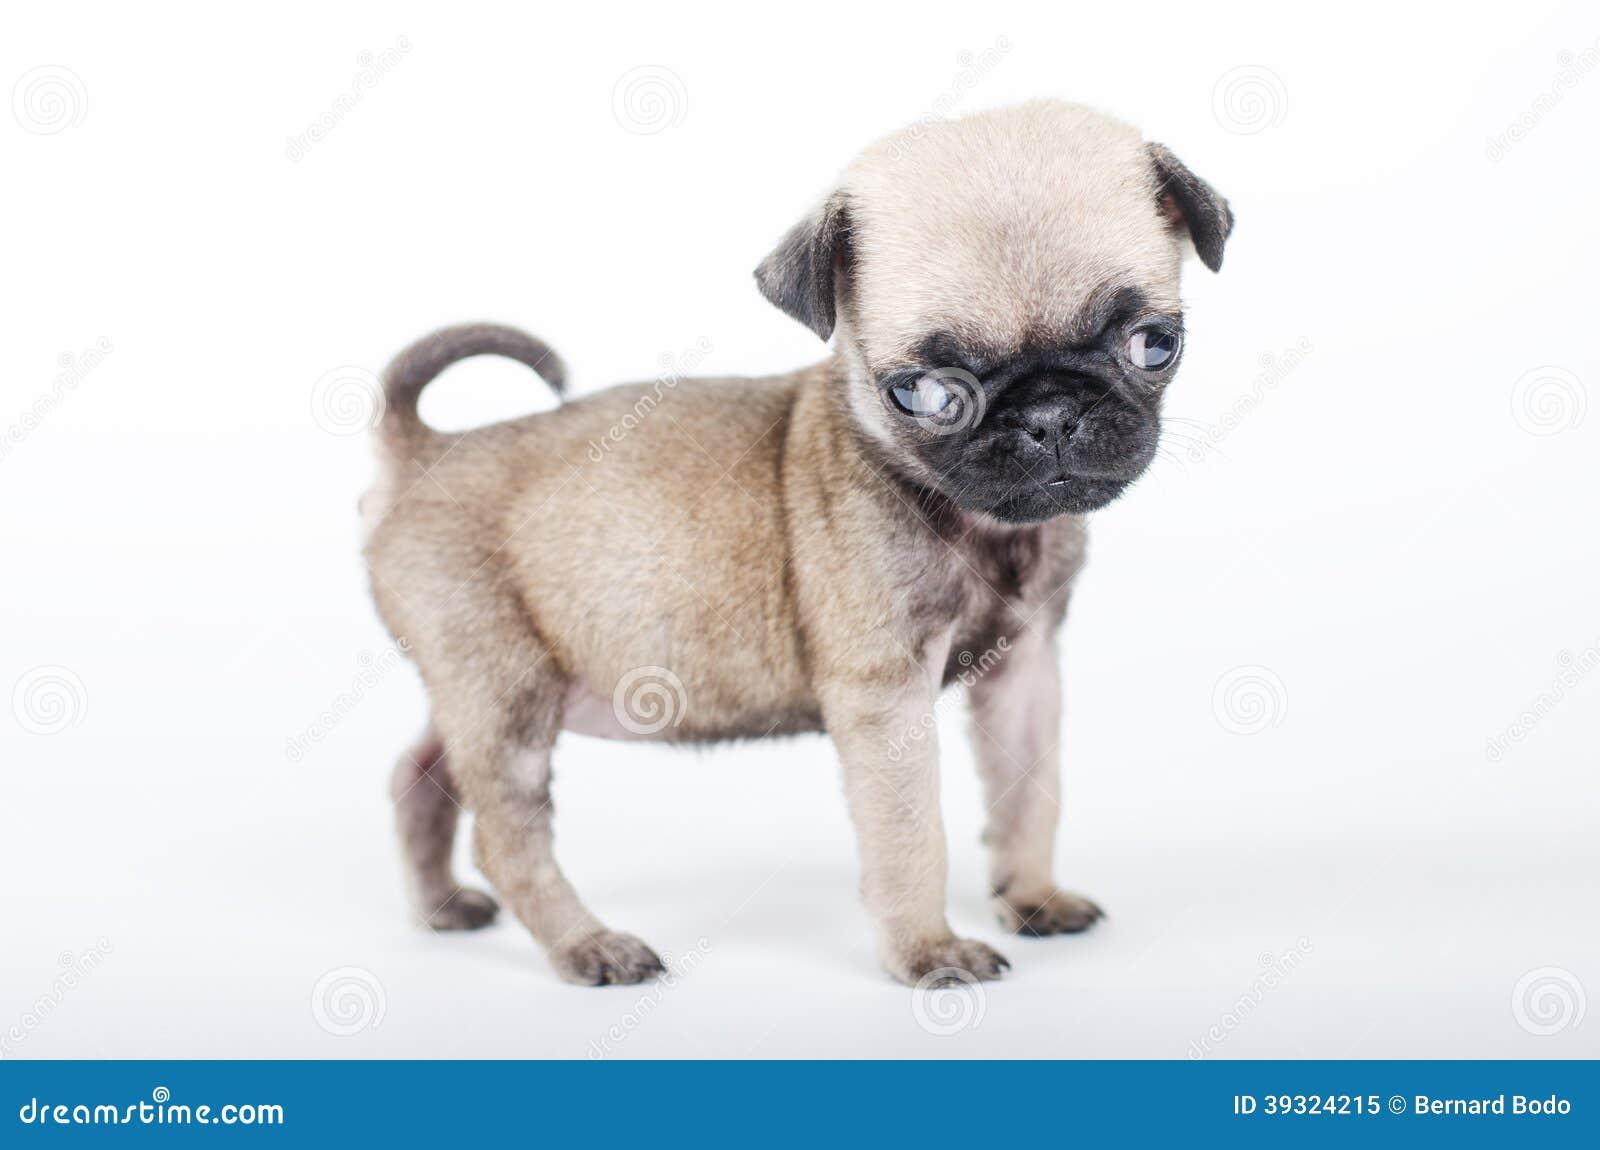 Newborn Pug Puppy Stock Photo - Image: 39324215